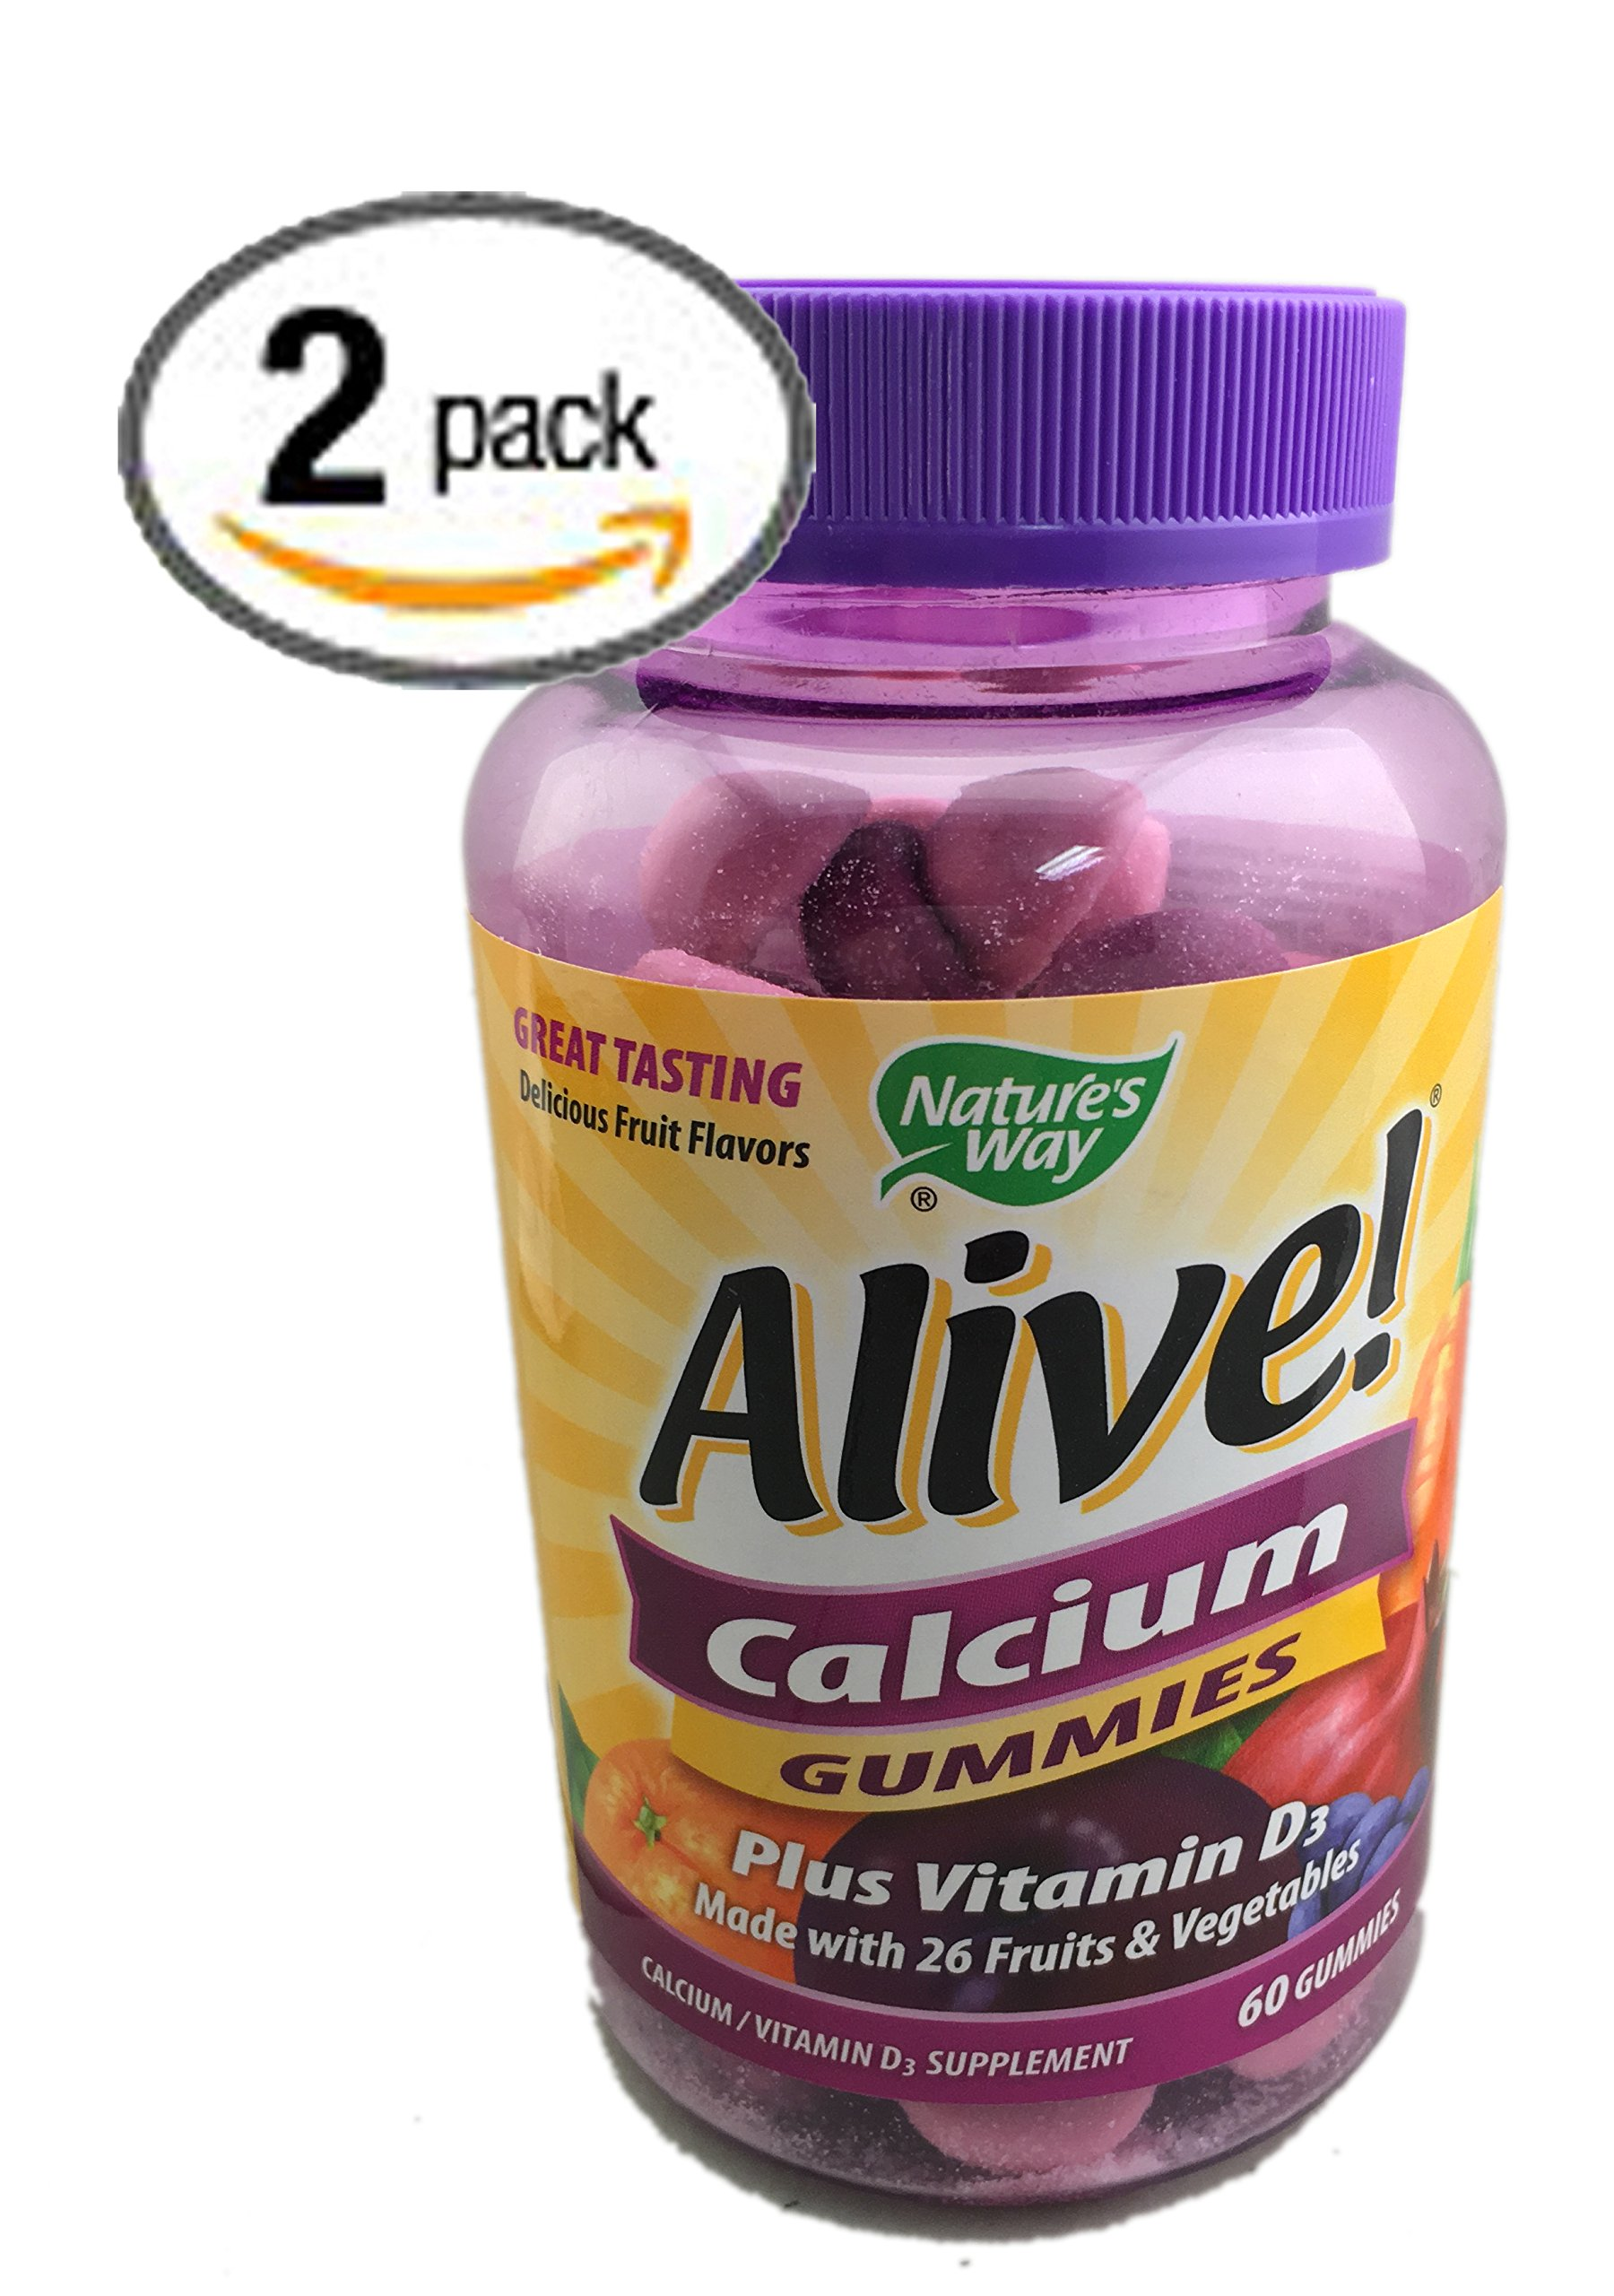 2-Pack Natures Way Alive! Calcium Gummies Plus Vitamin D3 - 60 Gummies Gluten Free and Vegetarian Friendly, 120 Calcium Gummies